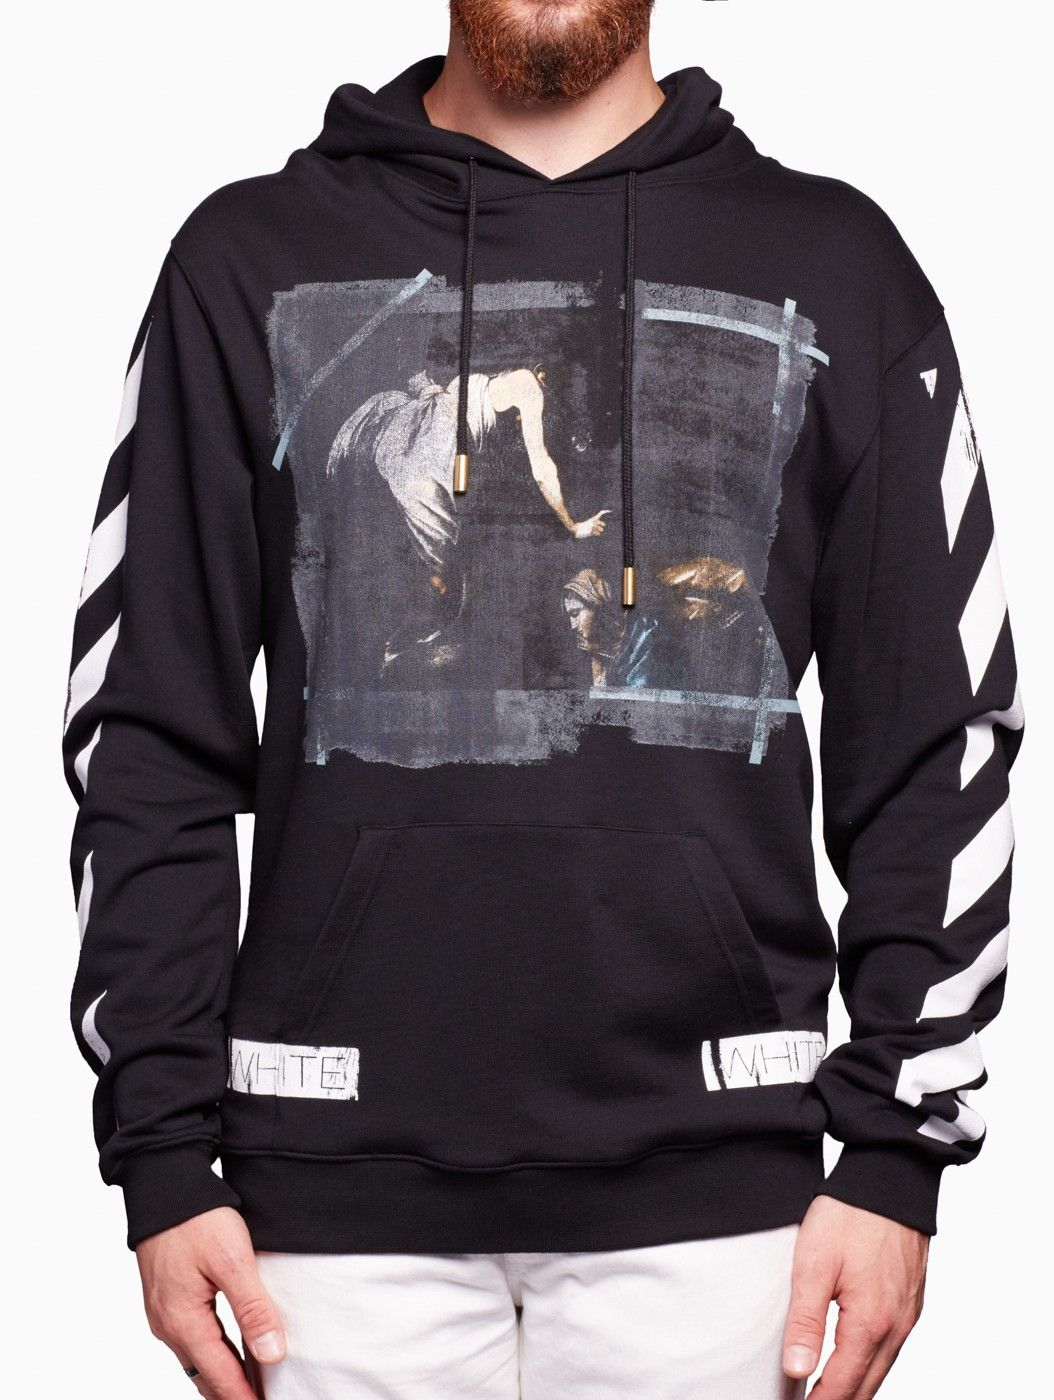 Caravaggio Hooded Sweatshirt From The S S2016 Off White C O Virgil Abloh In Black Sweatshirts Hooded Sweatshirts Hoodies